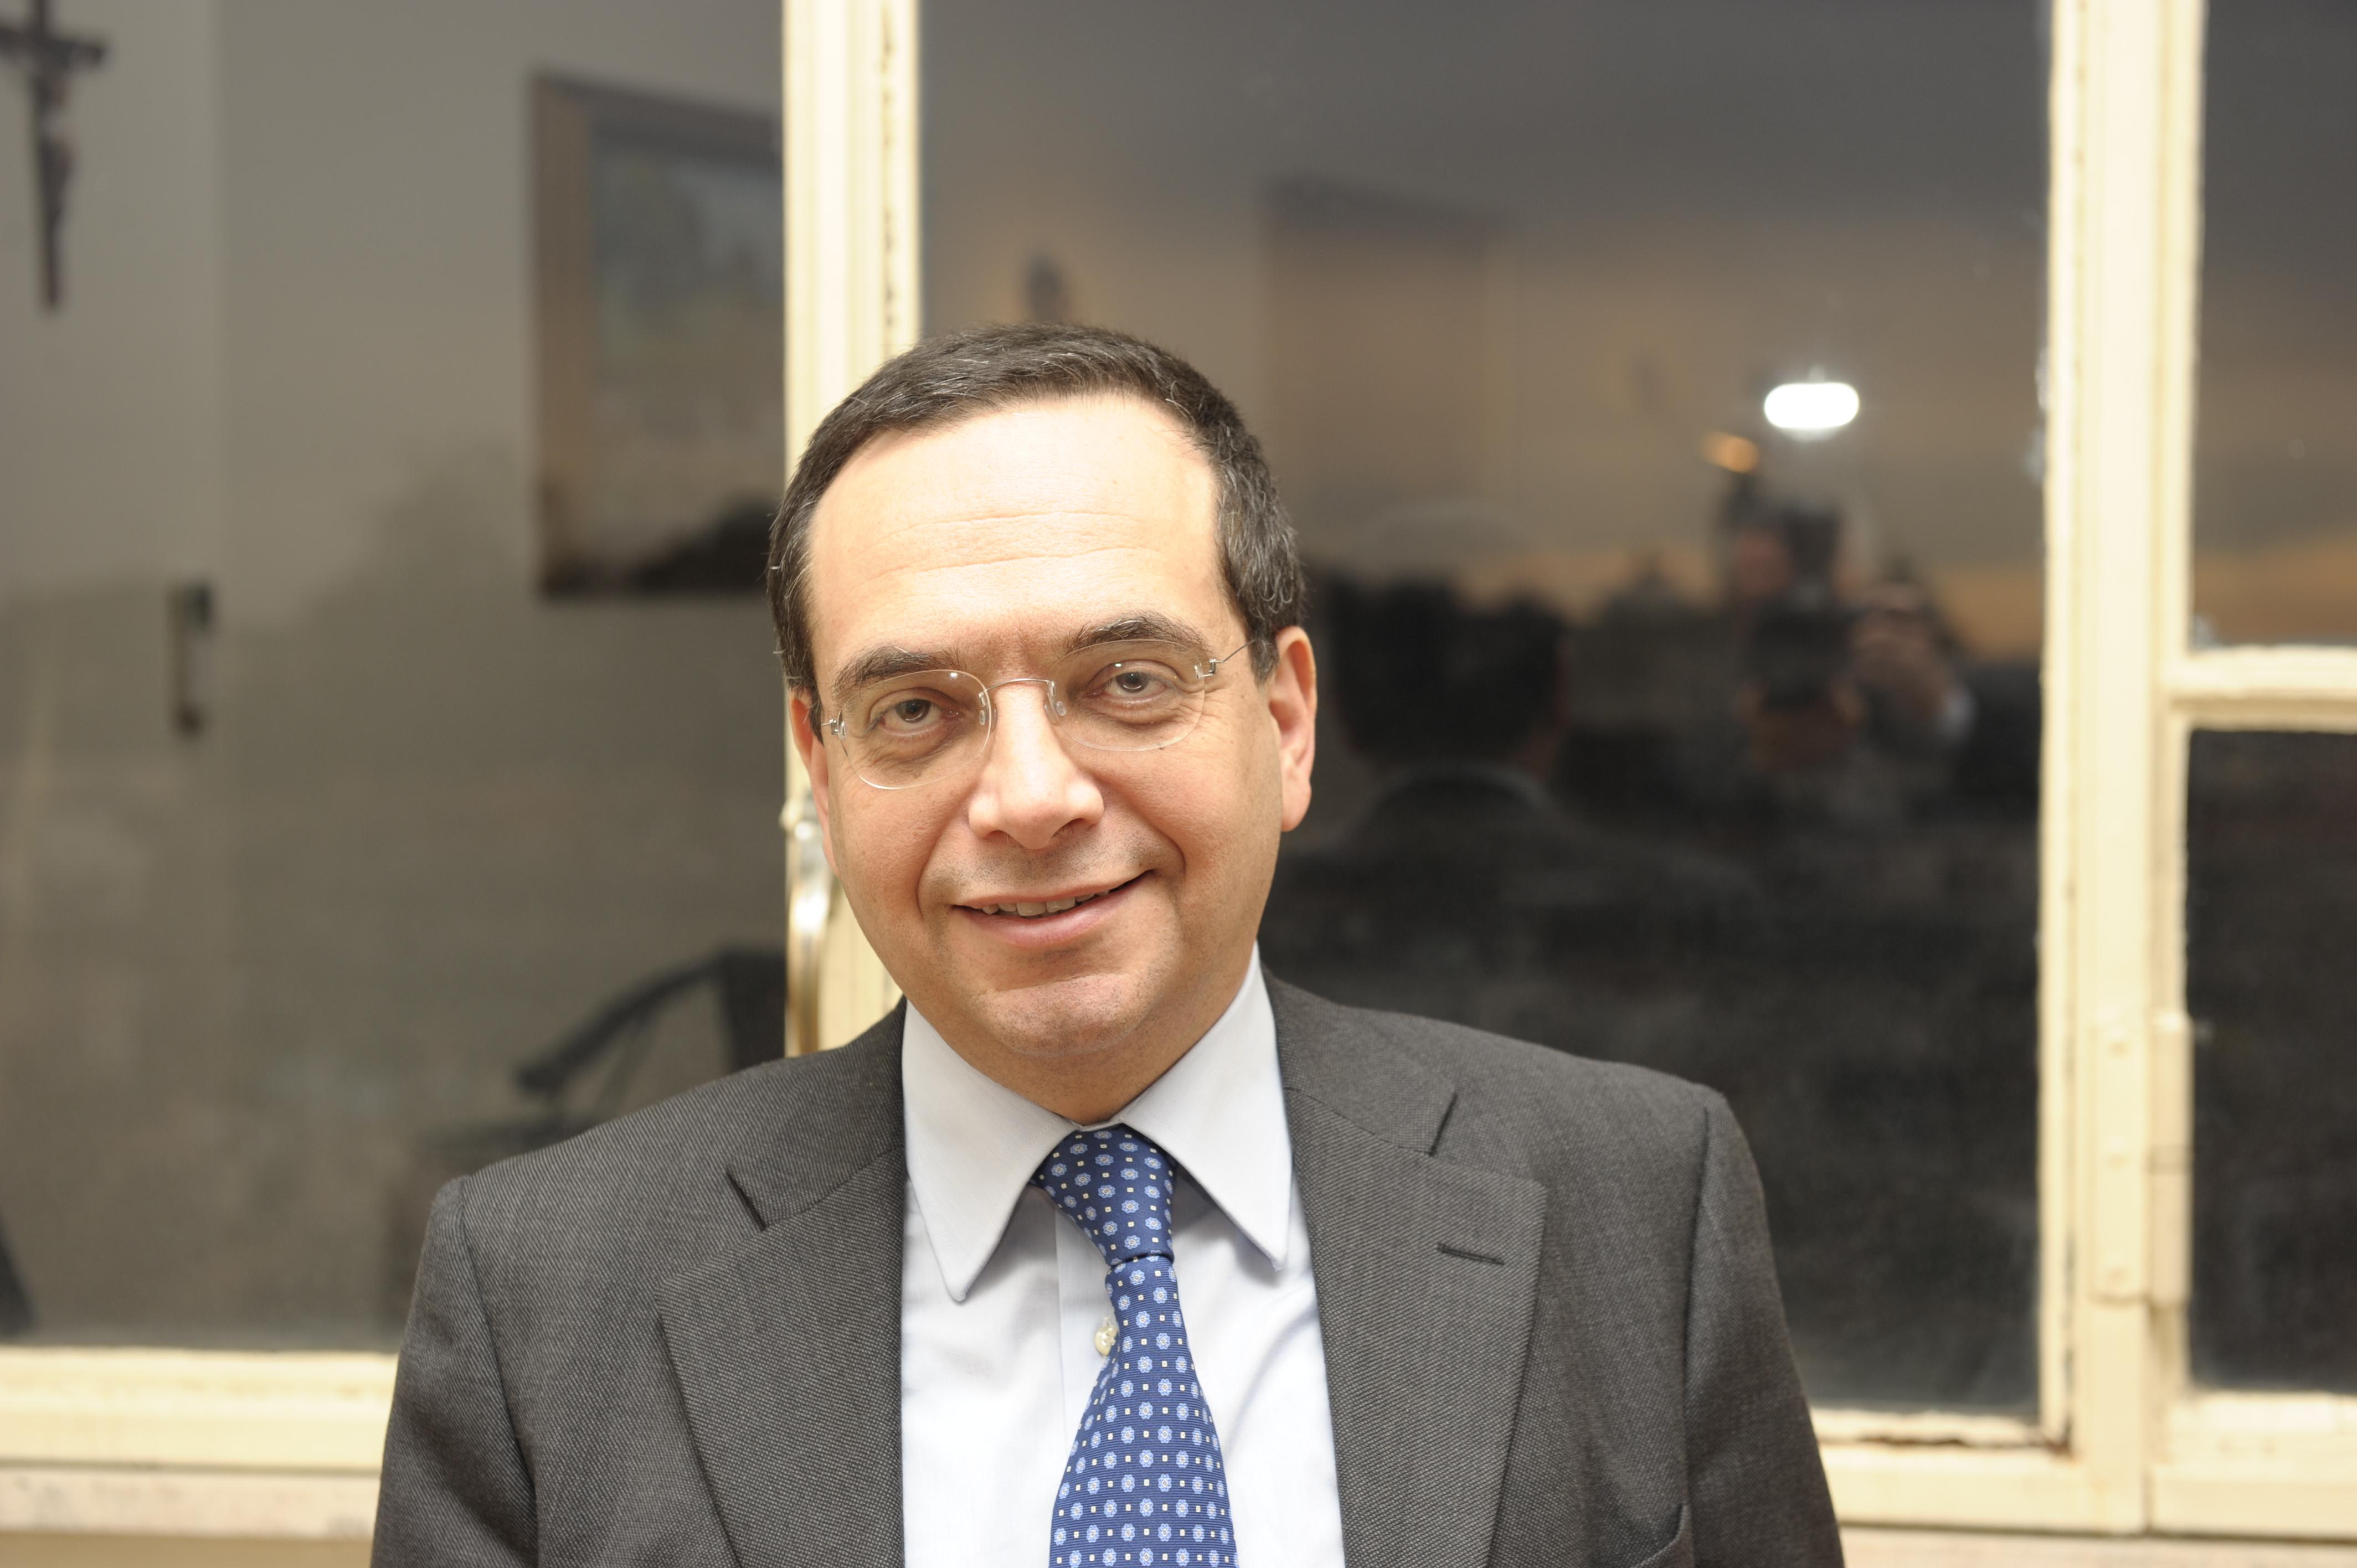 Tripoli Giuseppe